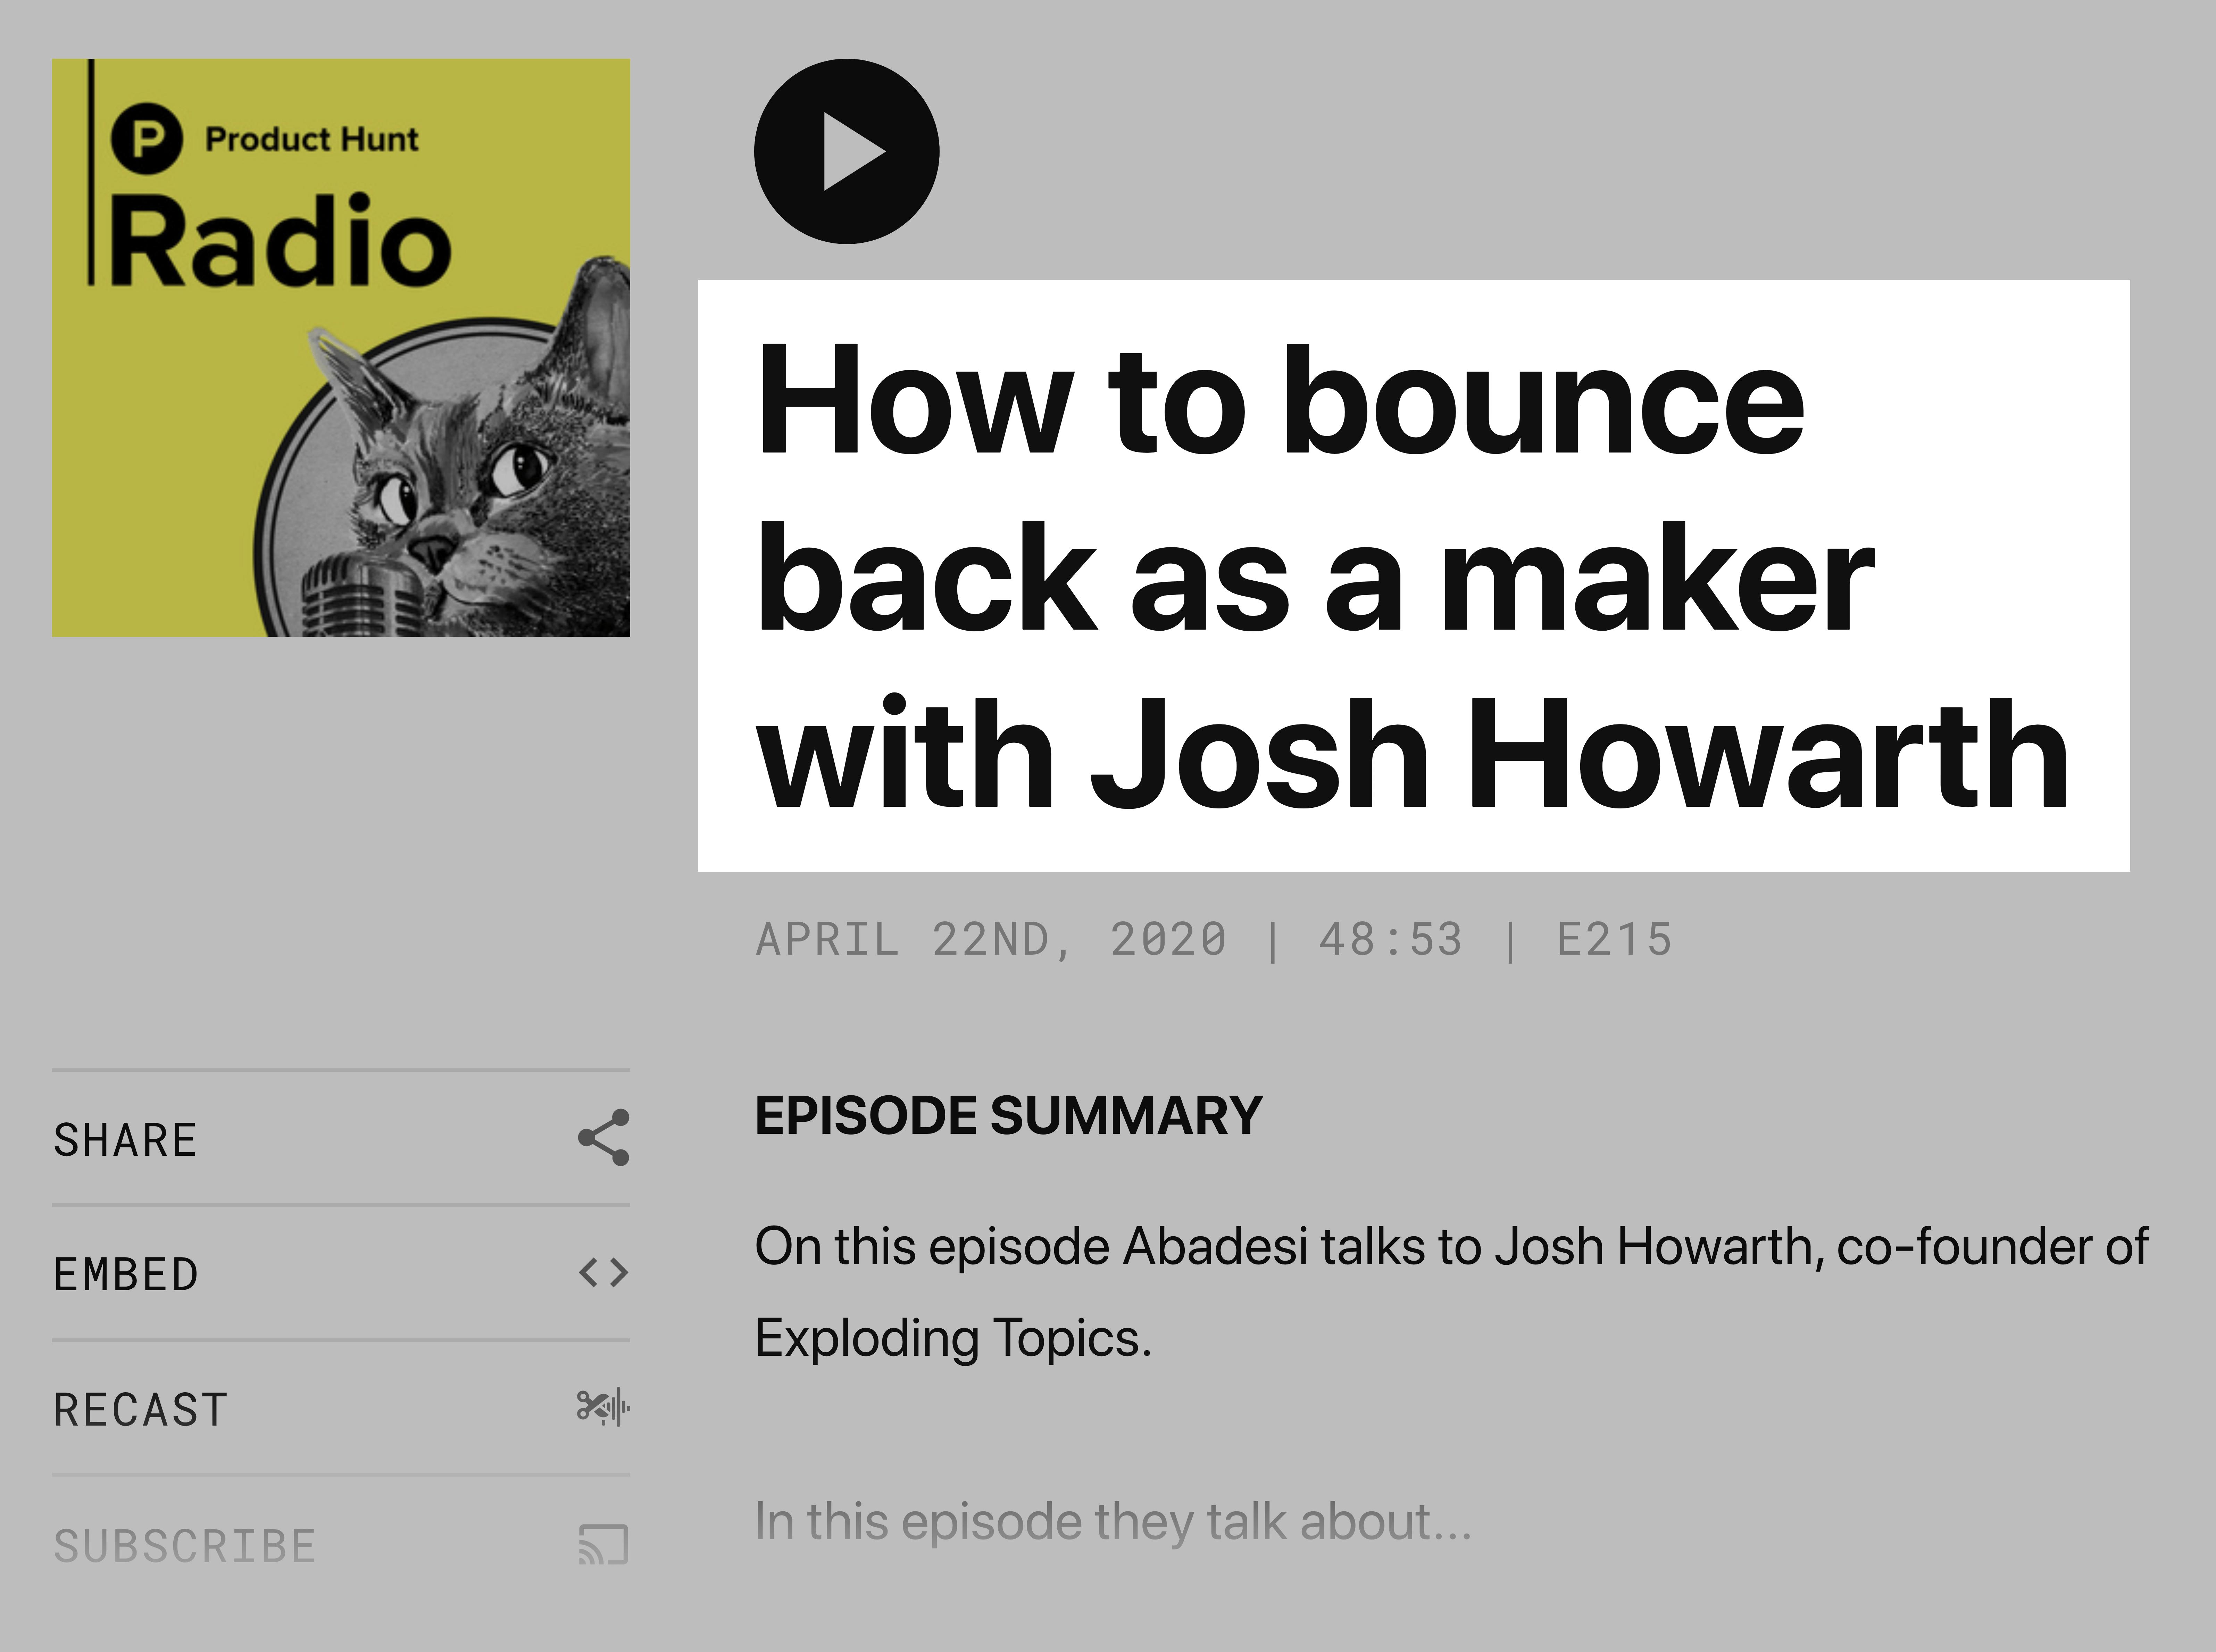 Josh on Product Hunt podcast